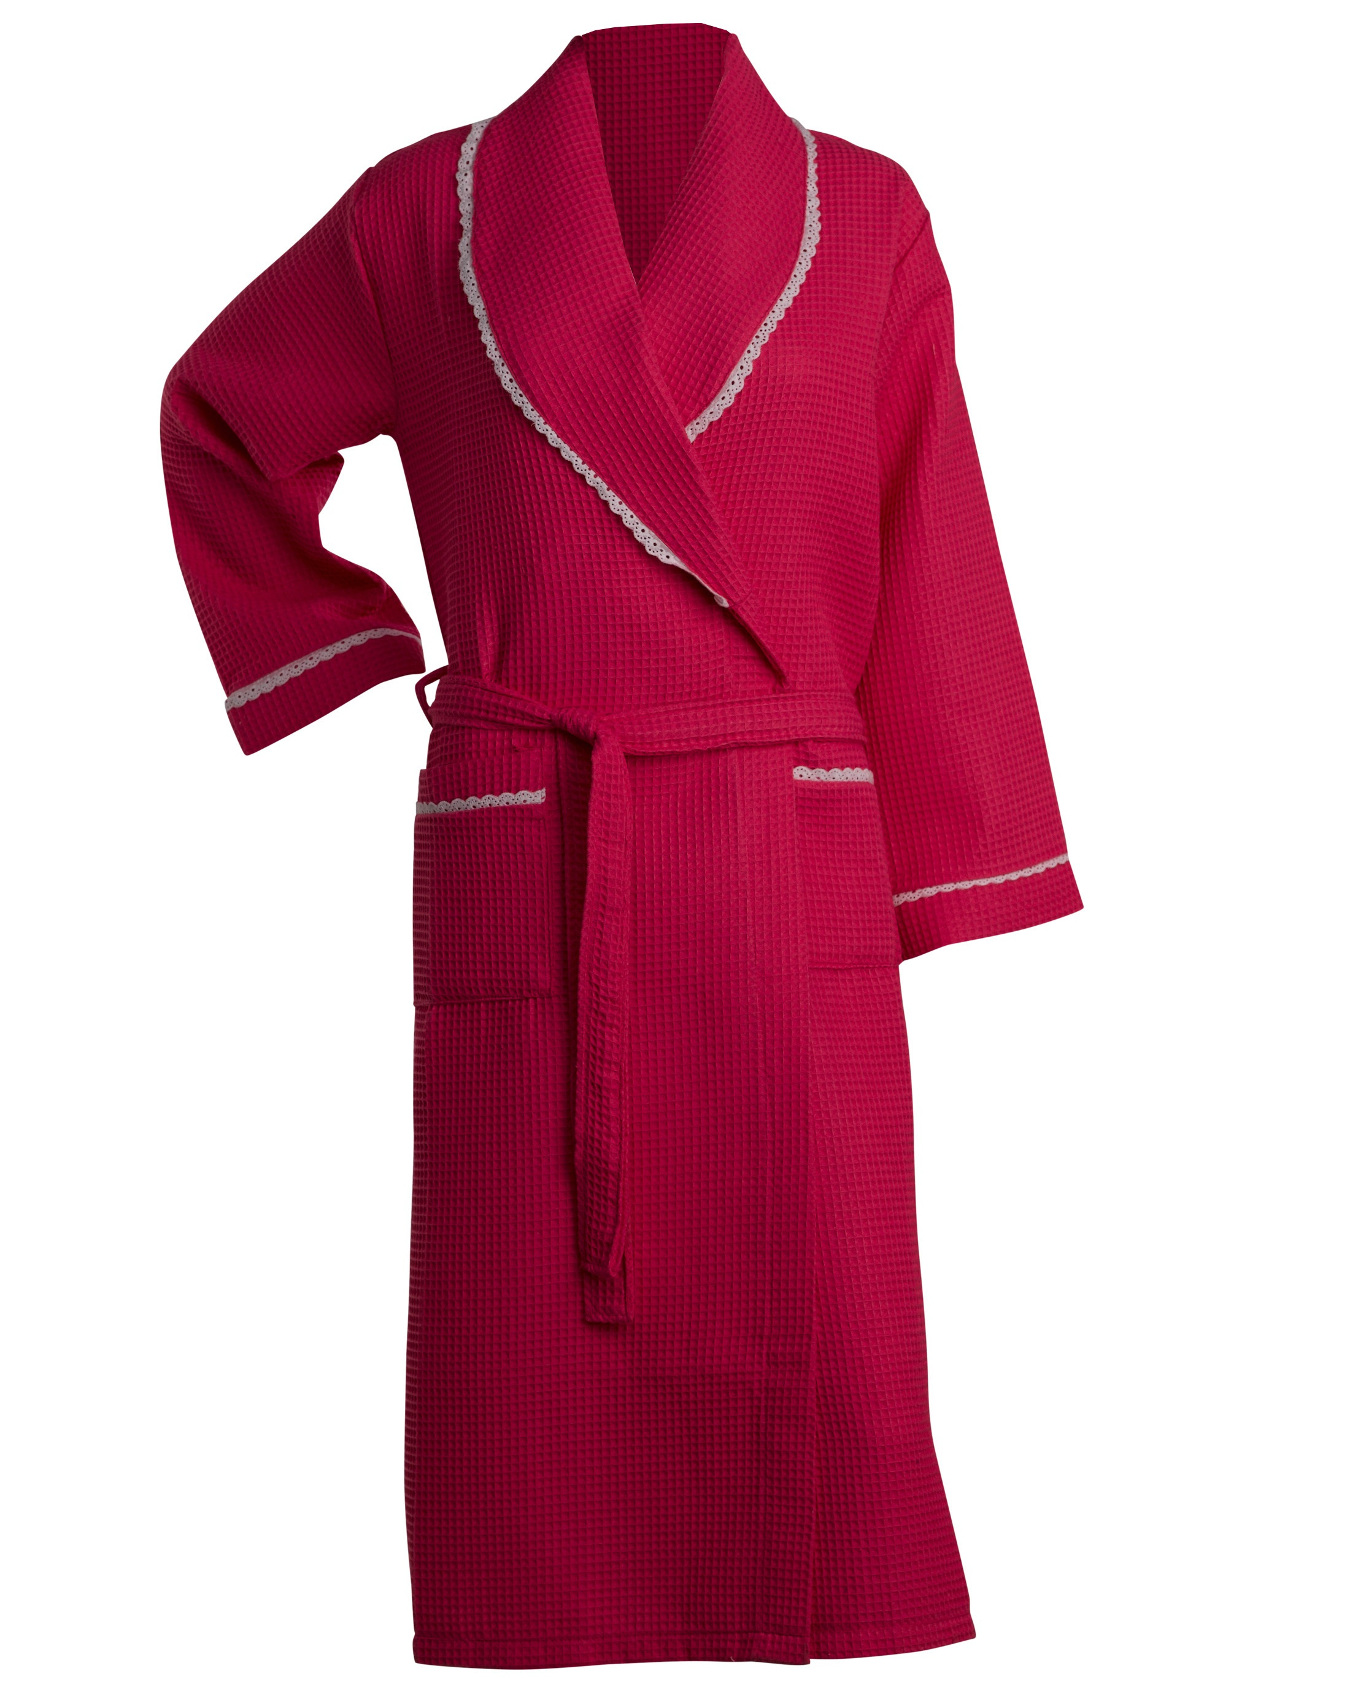 Bathrobe Womens Lightweight Waffle Lace Trim Dressing Gown ...